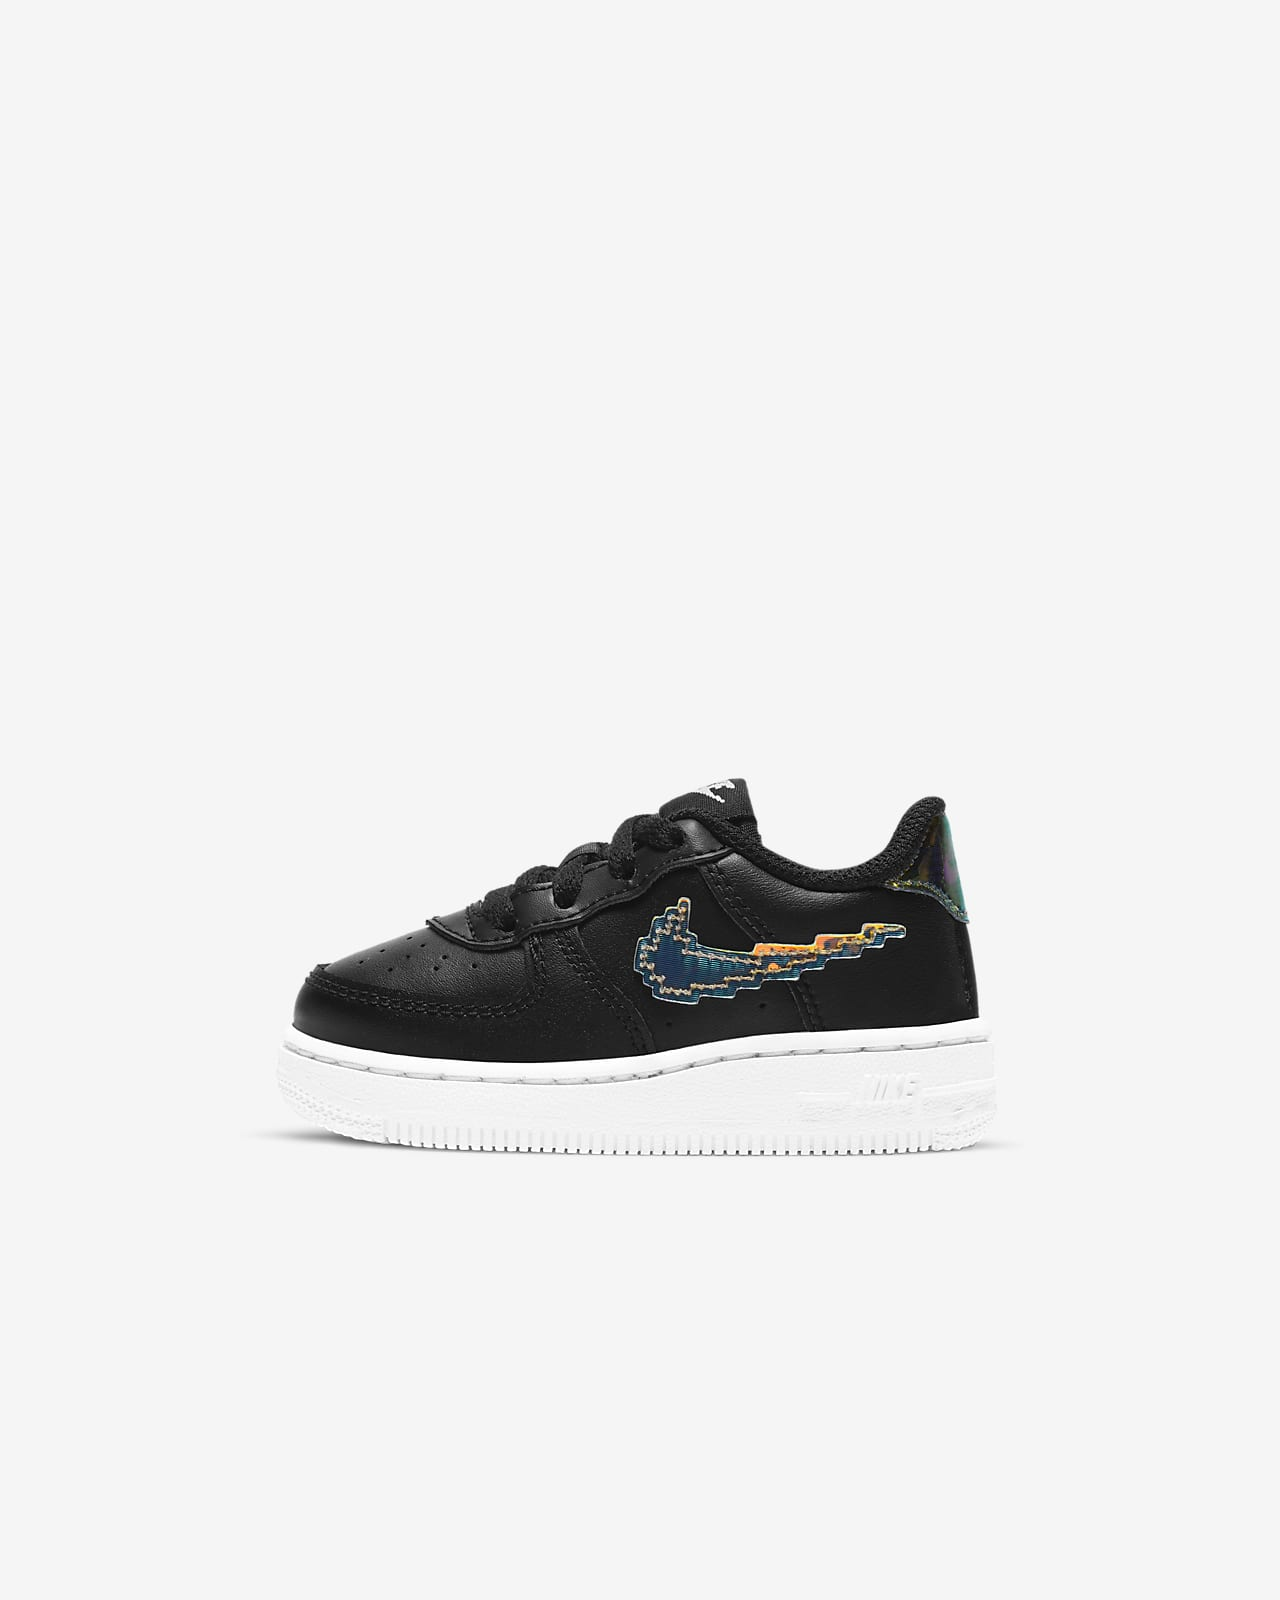 Nike Force 1 LV8 嬰幼兒鞋款